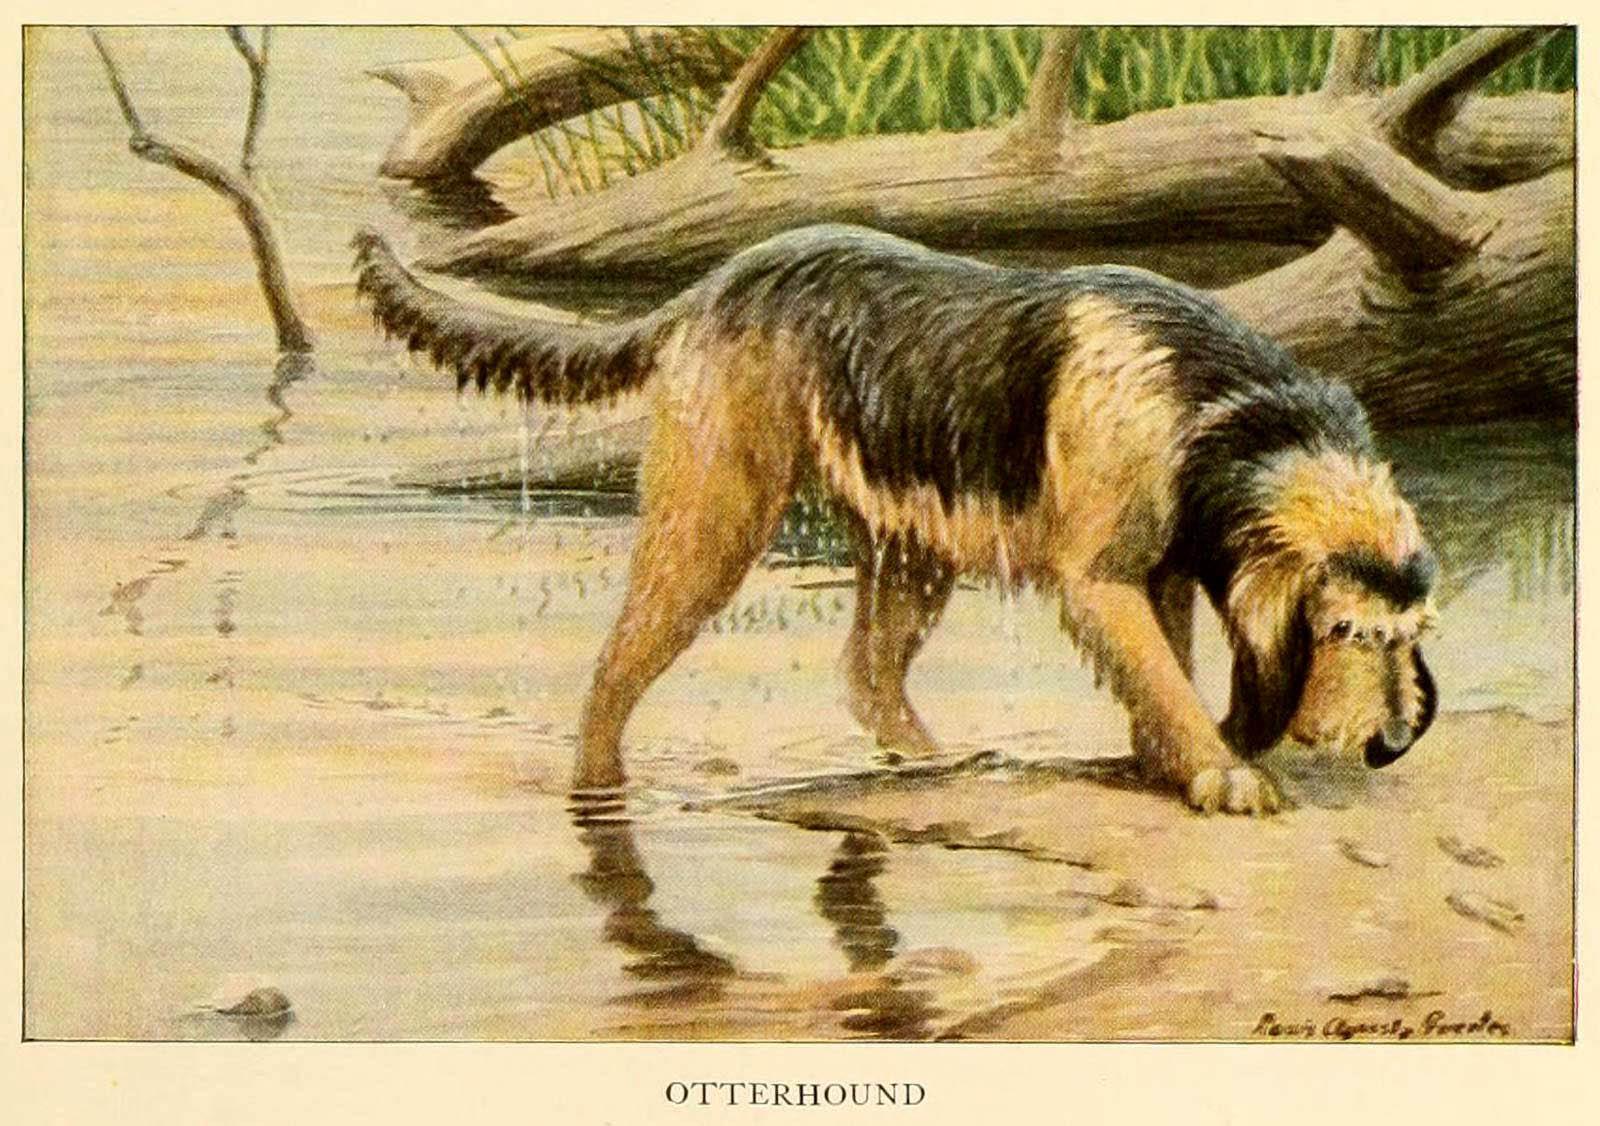 Otterhound Dog – Information About Dogs